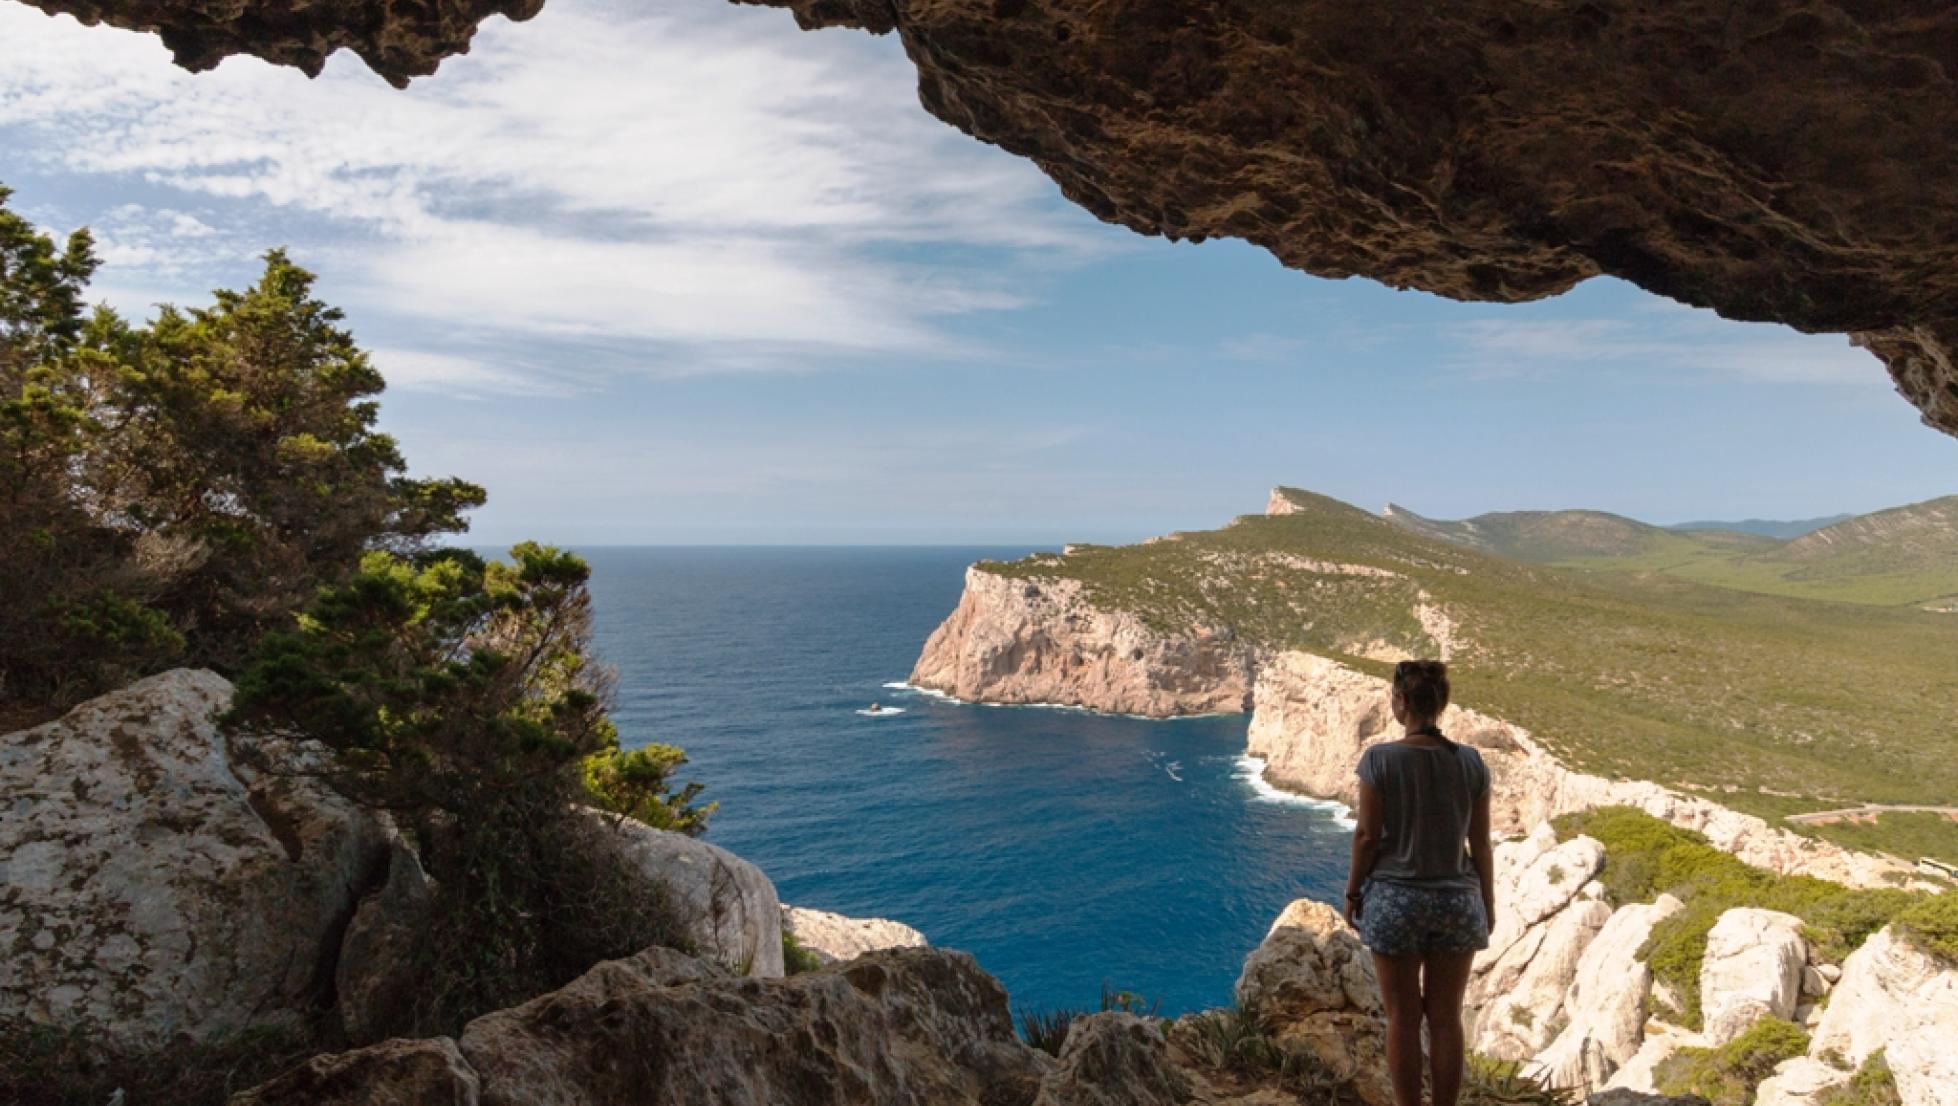 Veduta di Capo Caccia - Alghero